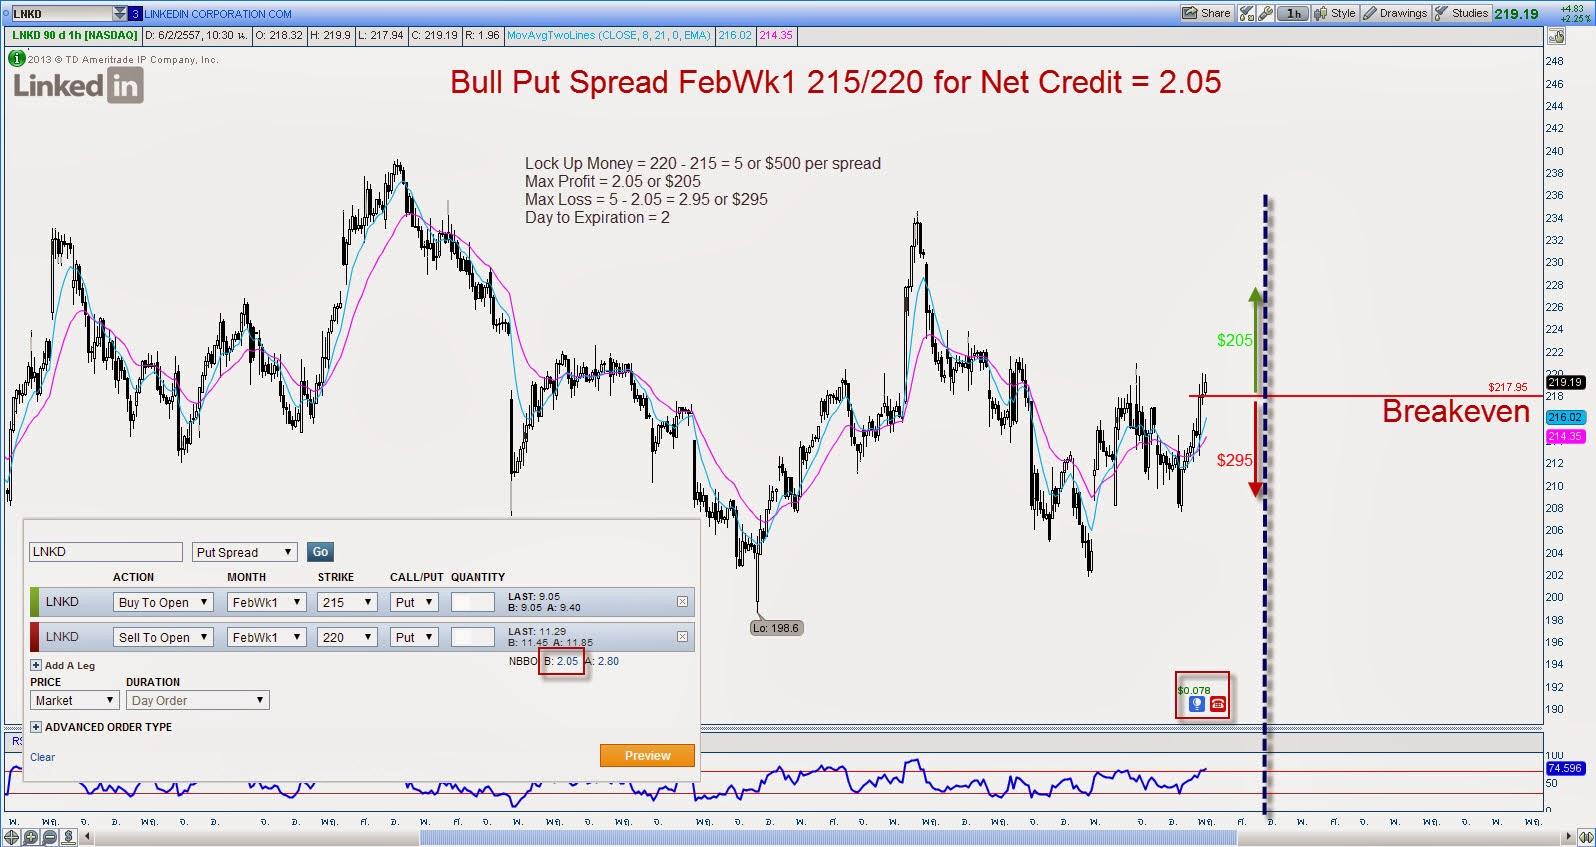 Fx options trader barclays linkedin